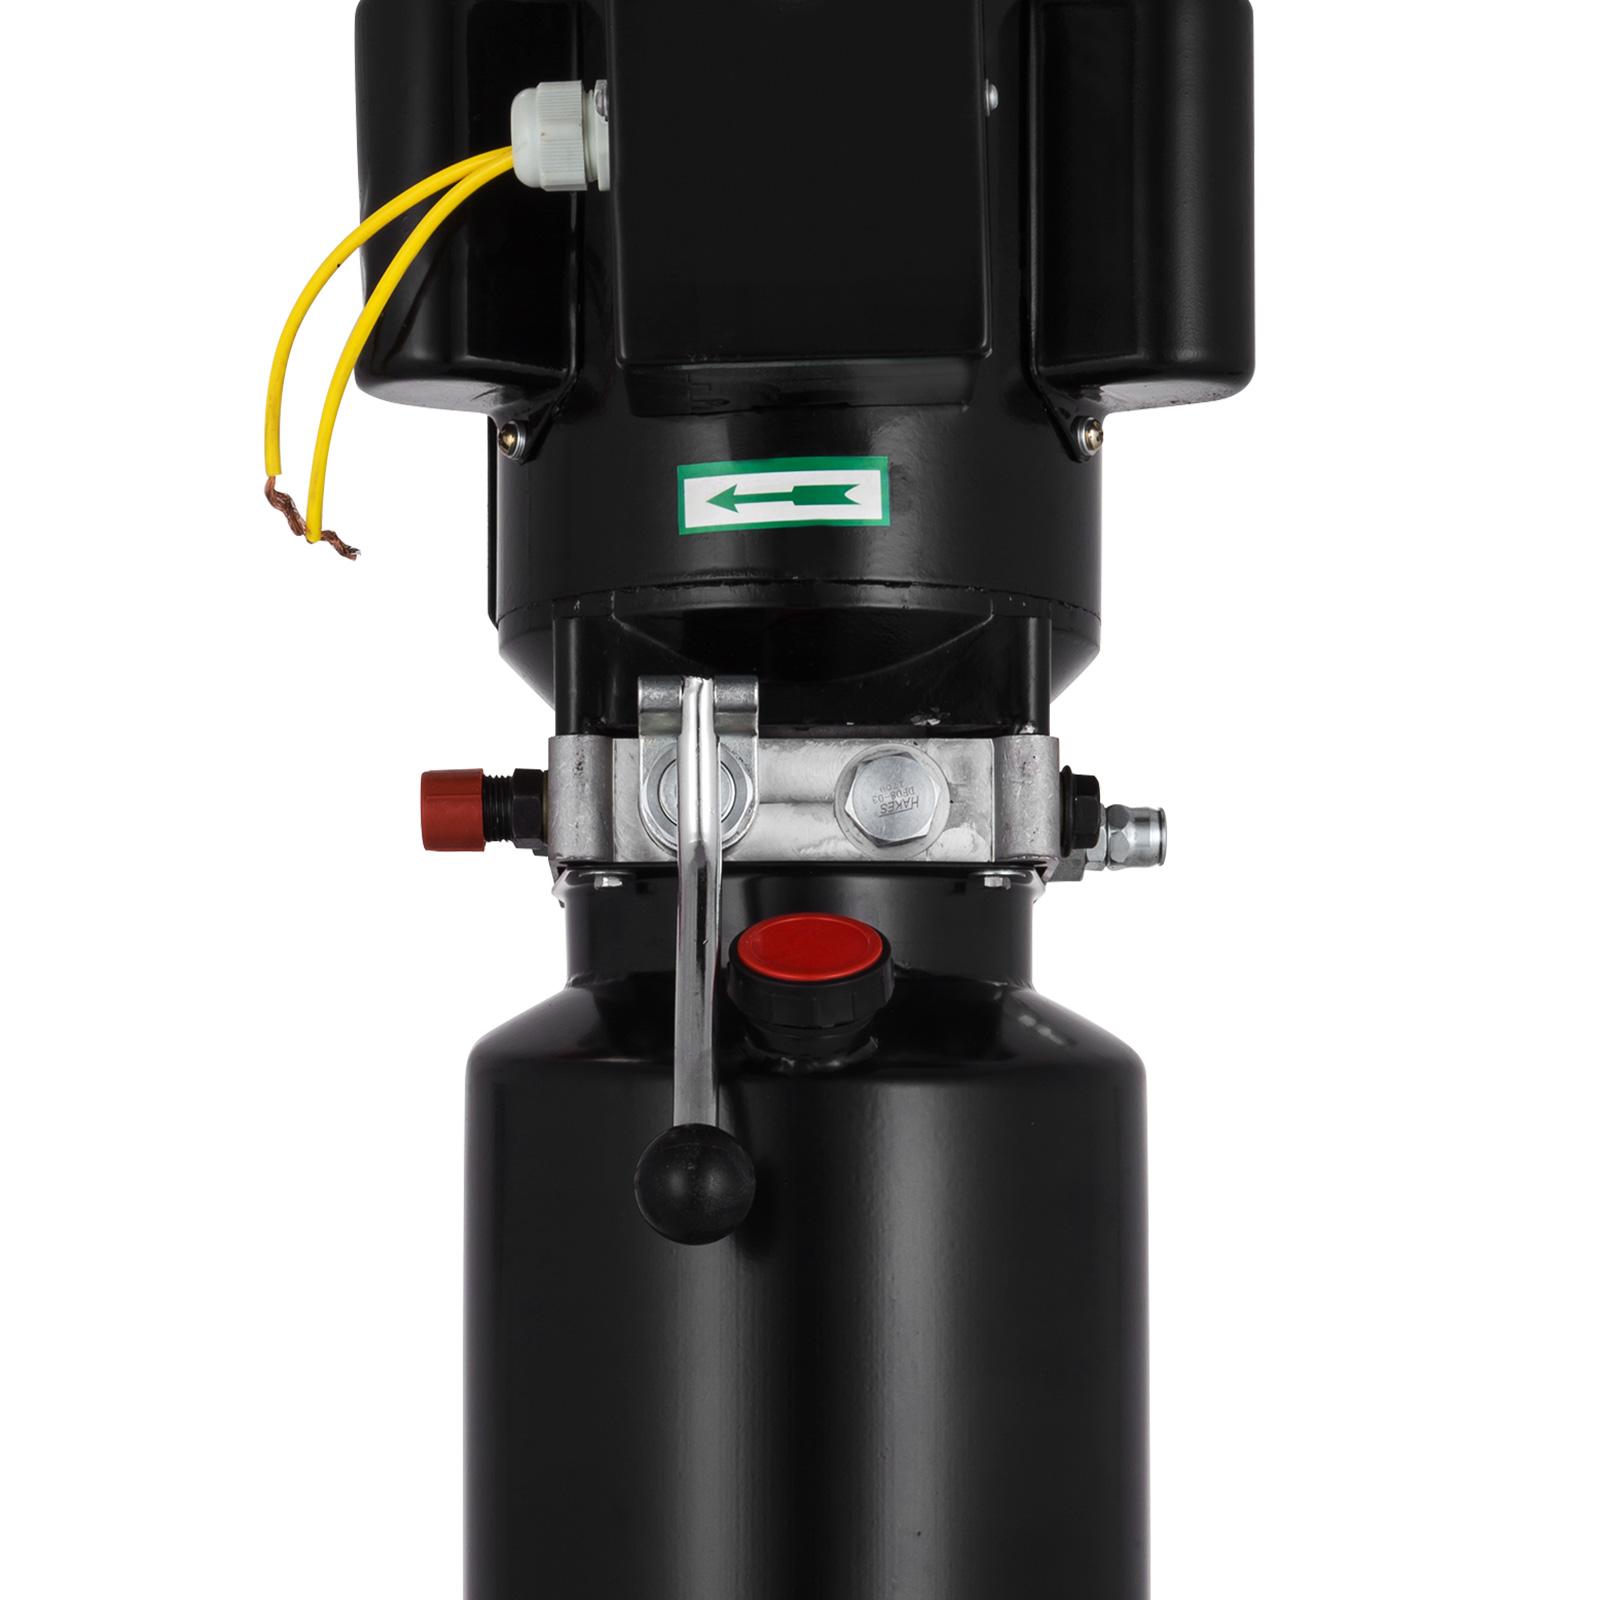 Hydraulic Auto Lift : Hydraulic car lift jack auto hoist v gates single